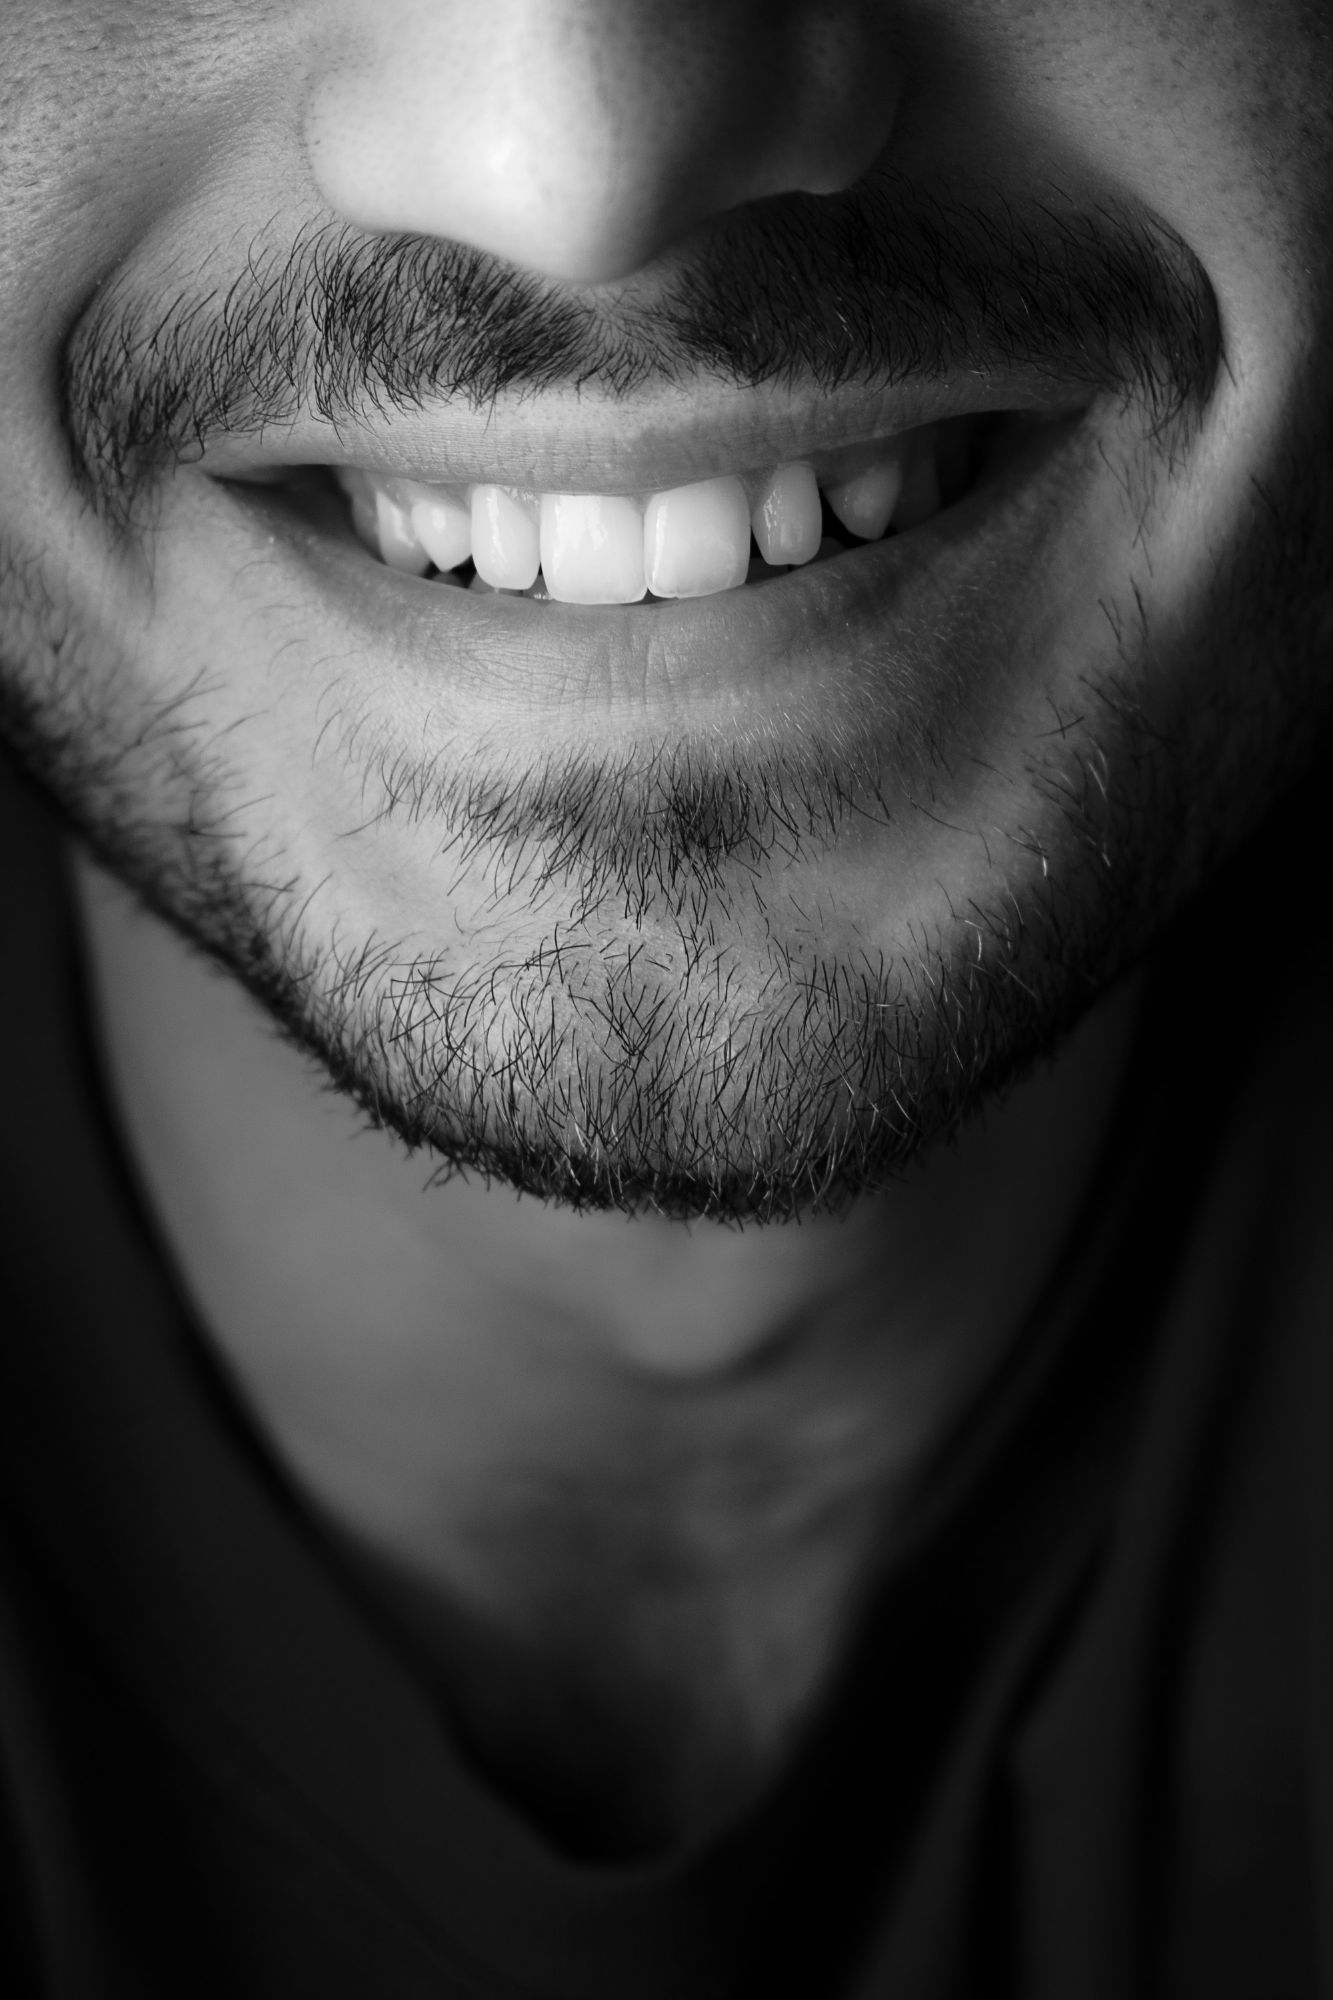 A set of bright white teeth